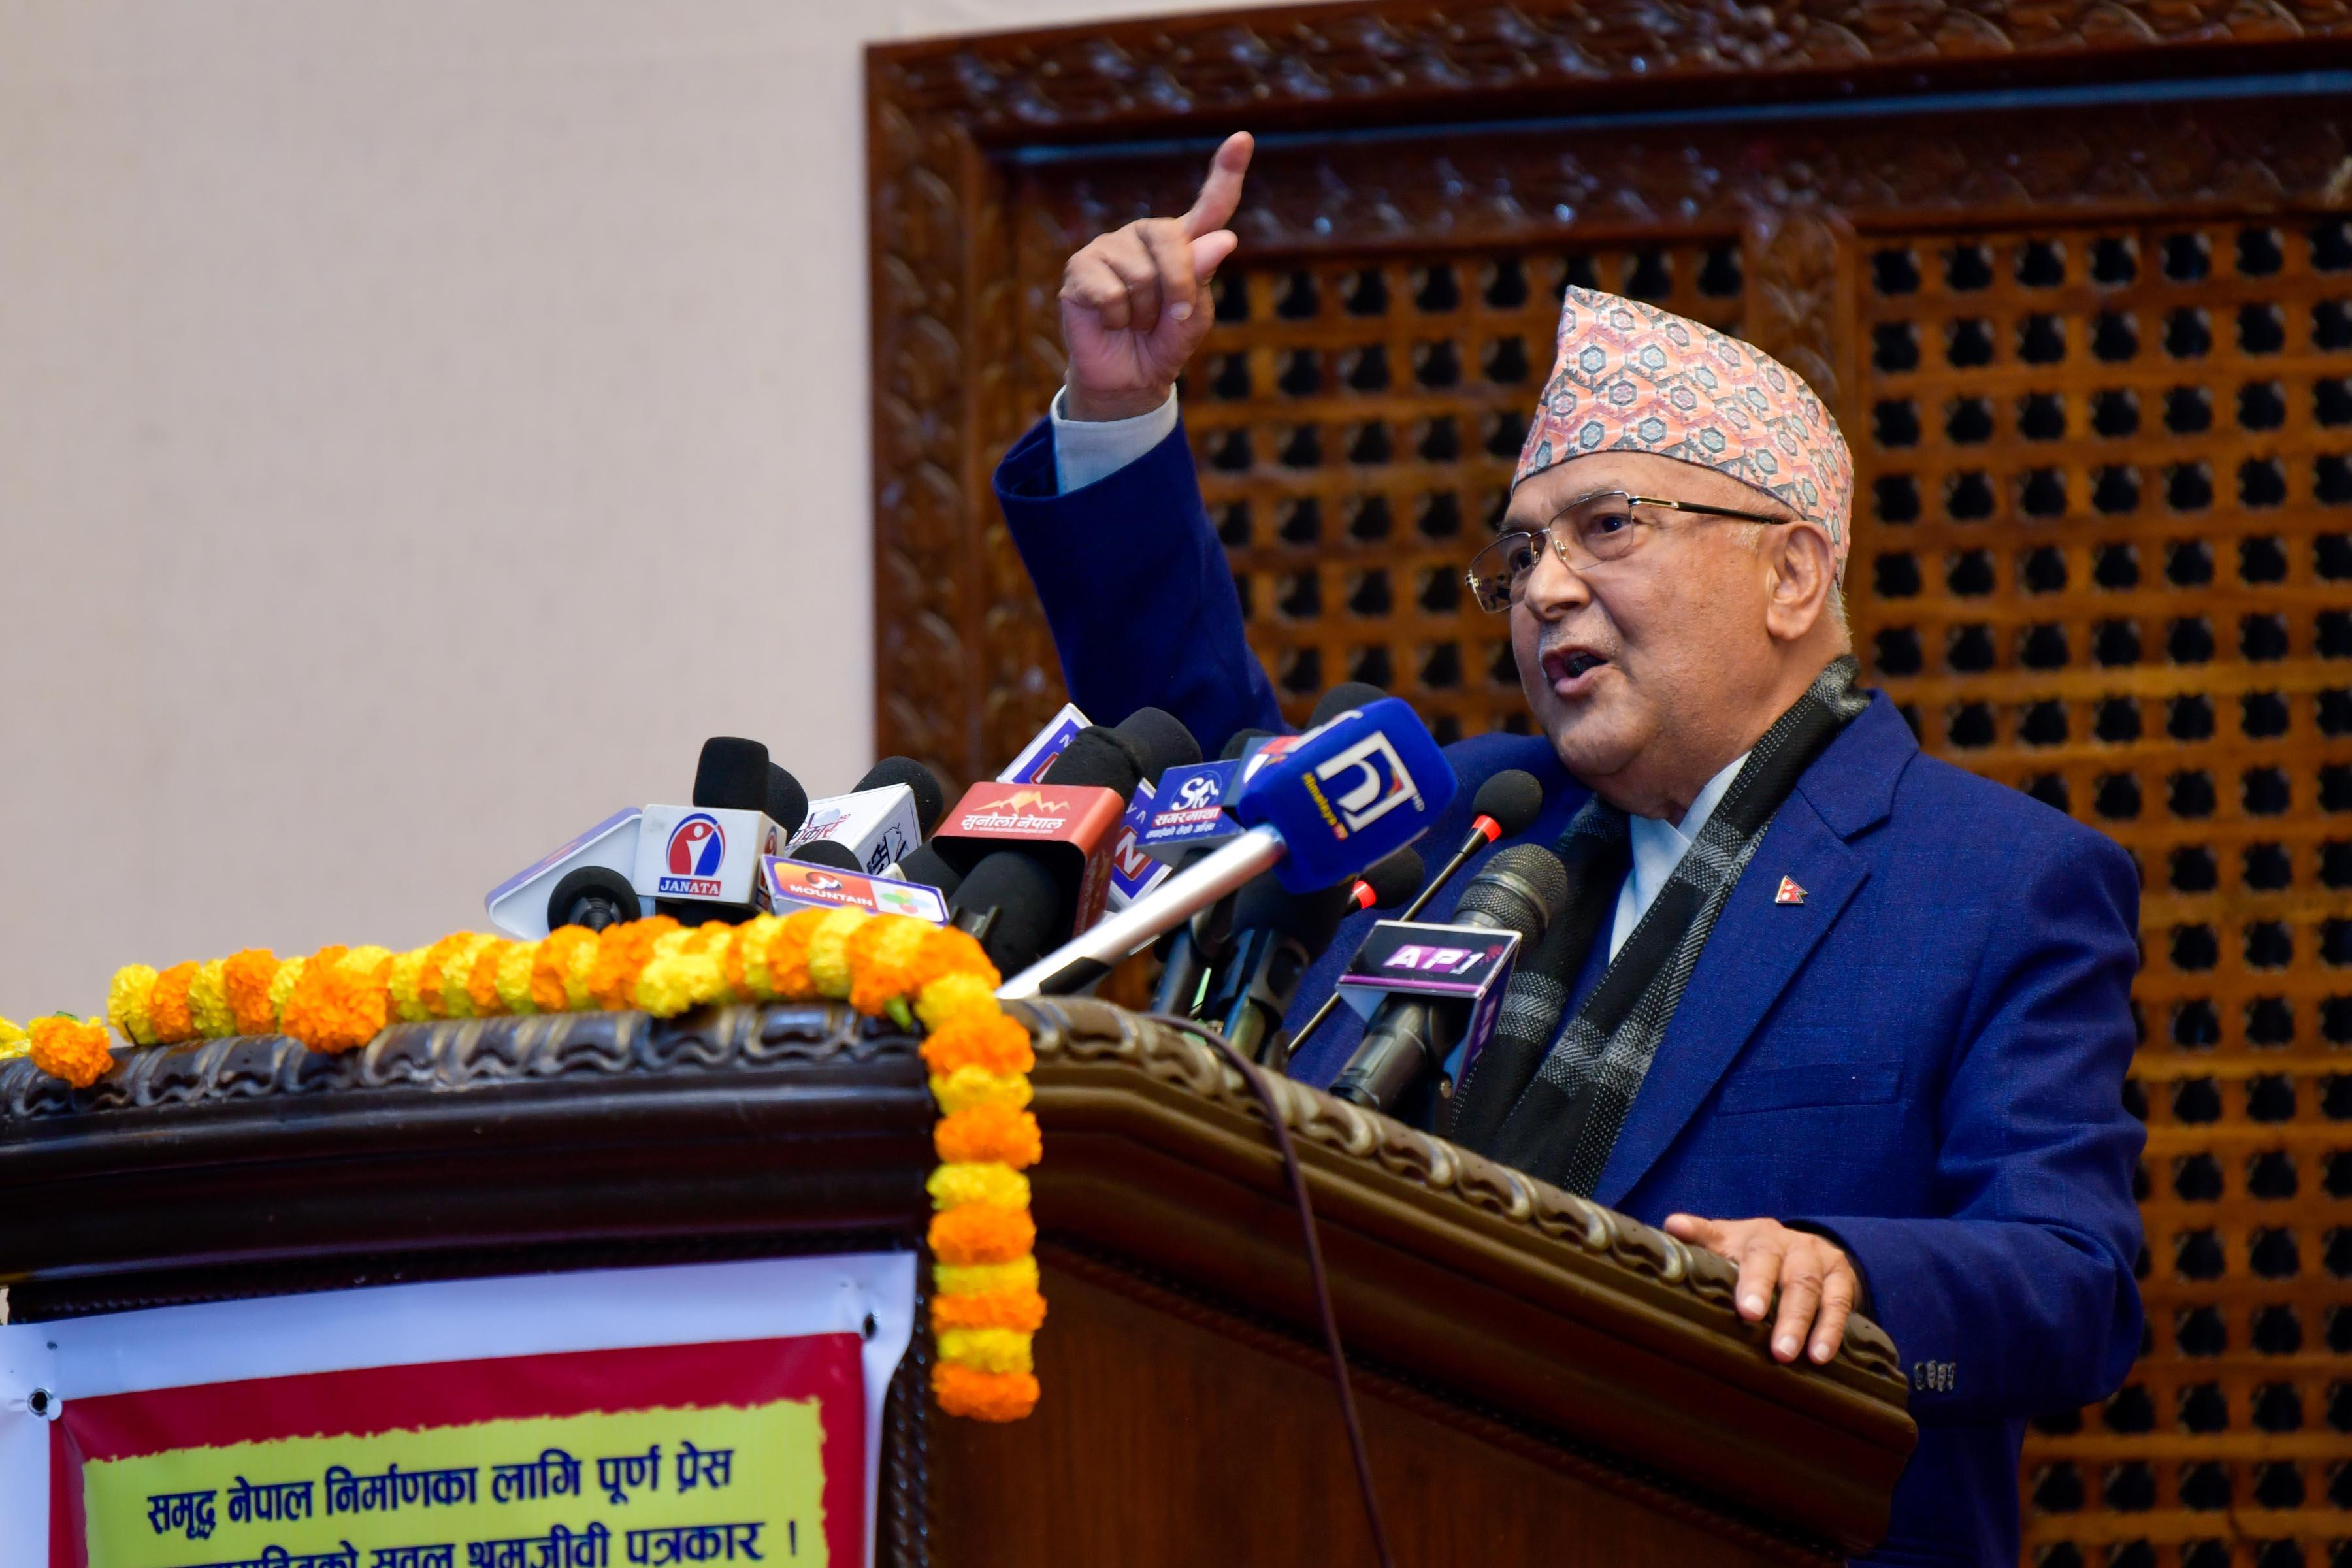 Prime Minister KP Sharma Oli addresses the second General Assembly of Press Organisation Nepal, in Kathmandu, on Thursday, January 21, 2021. Courtesy: Rajan Kafle